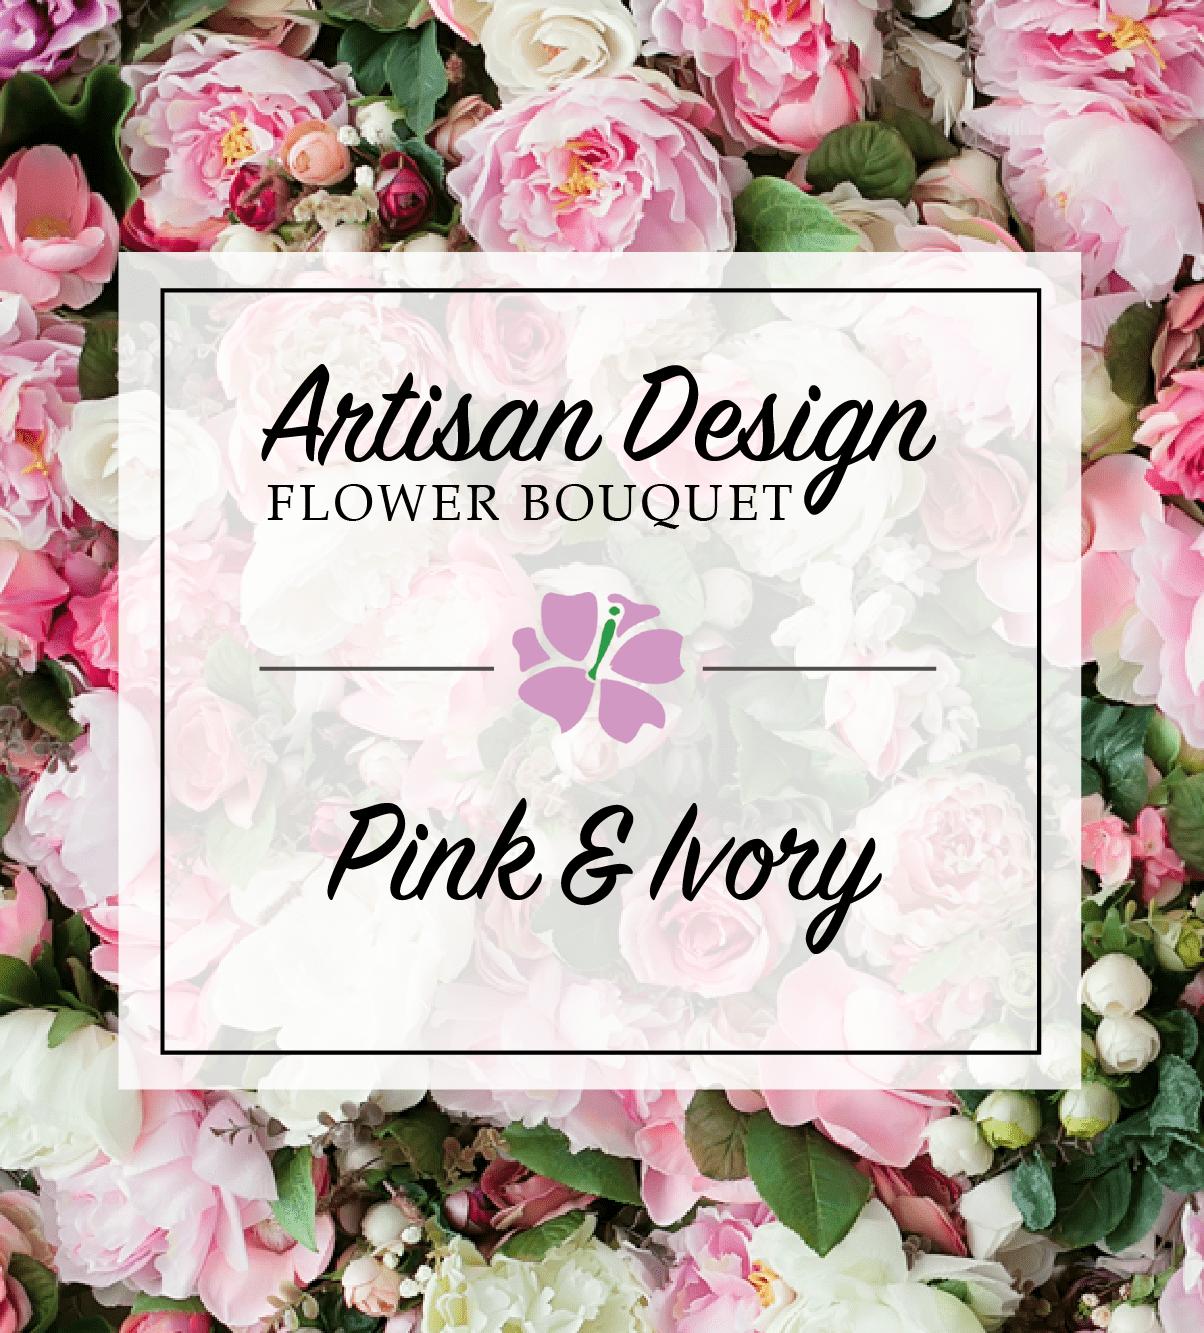 Artist's Design: Pink & Ivory